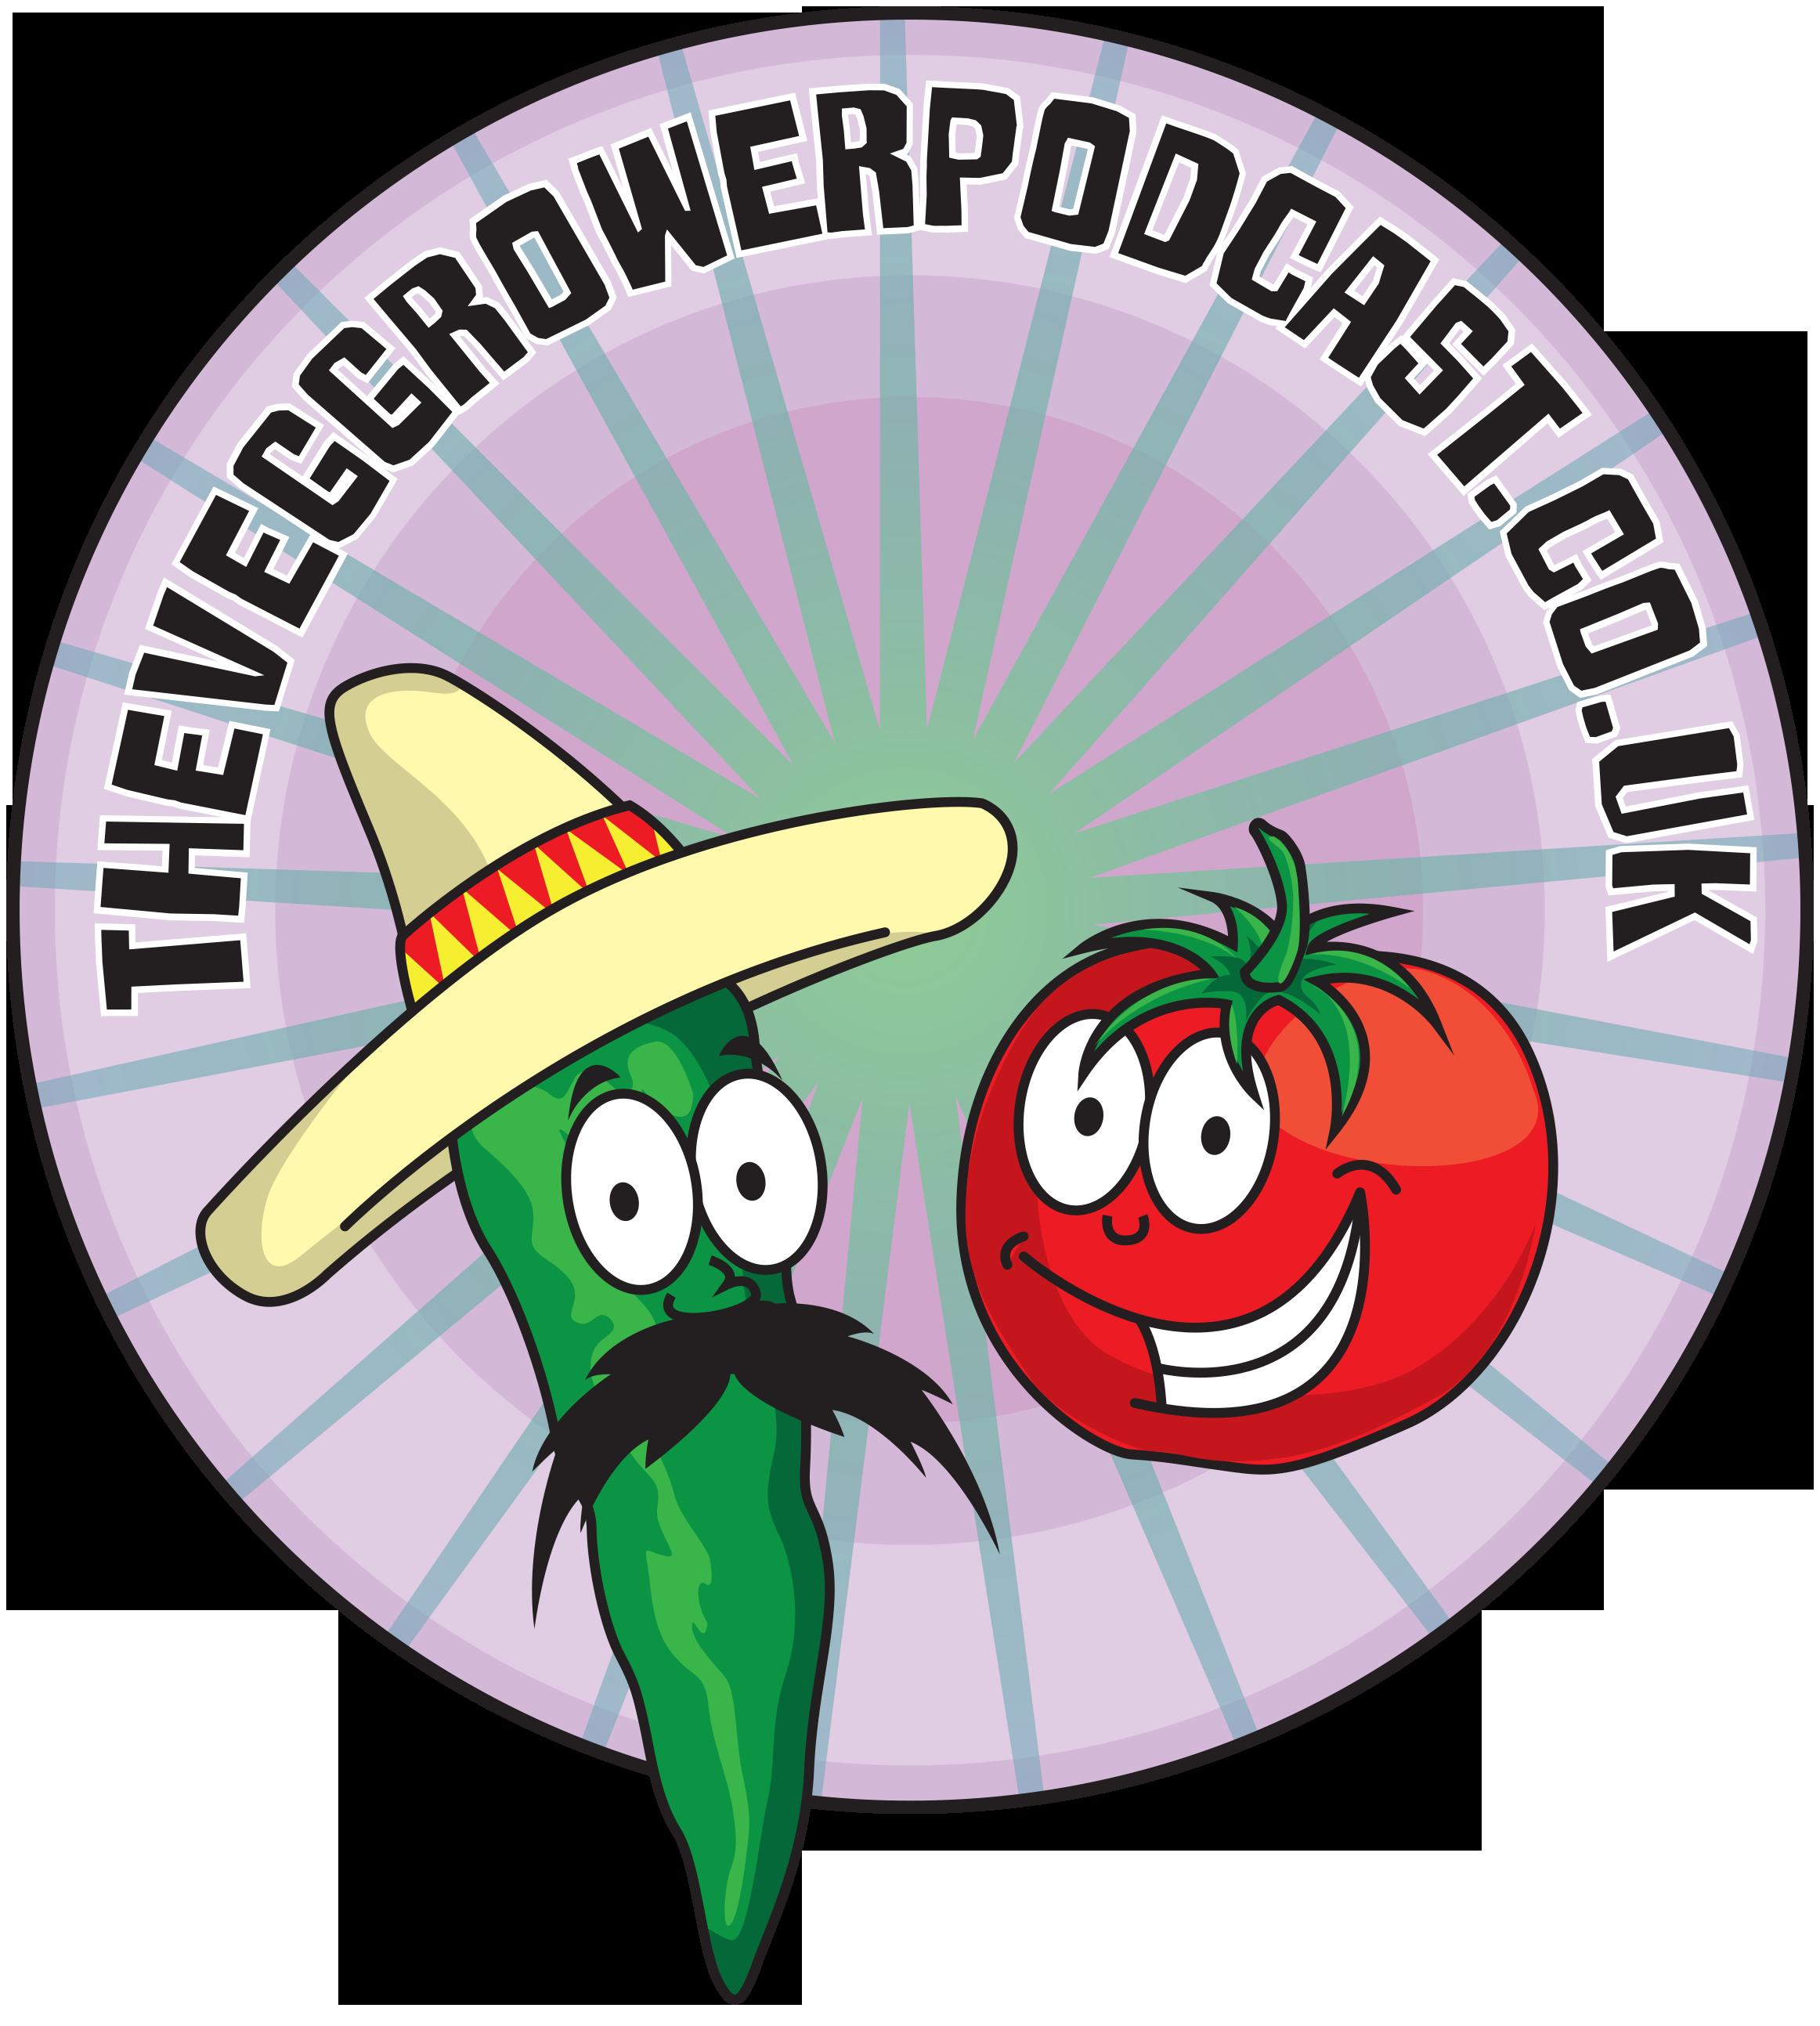 The veg grower podcast